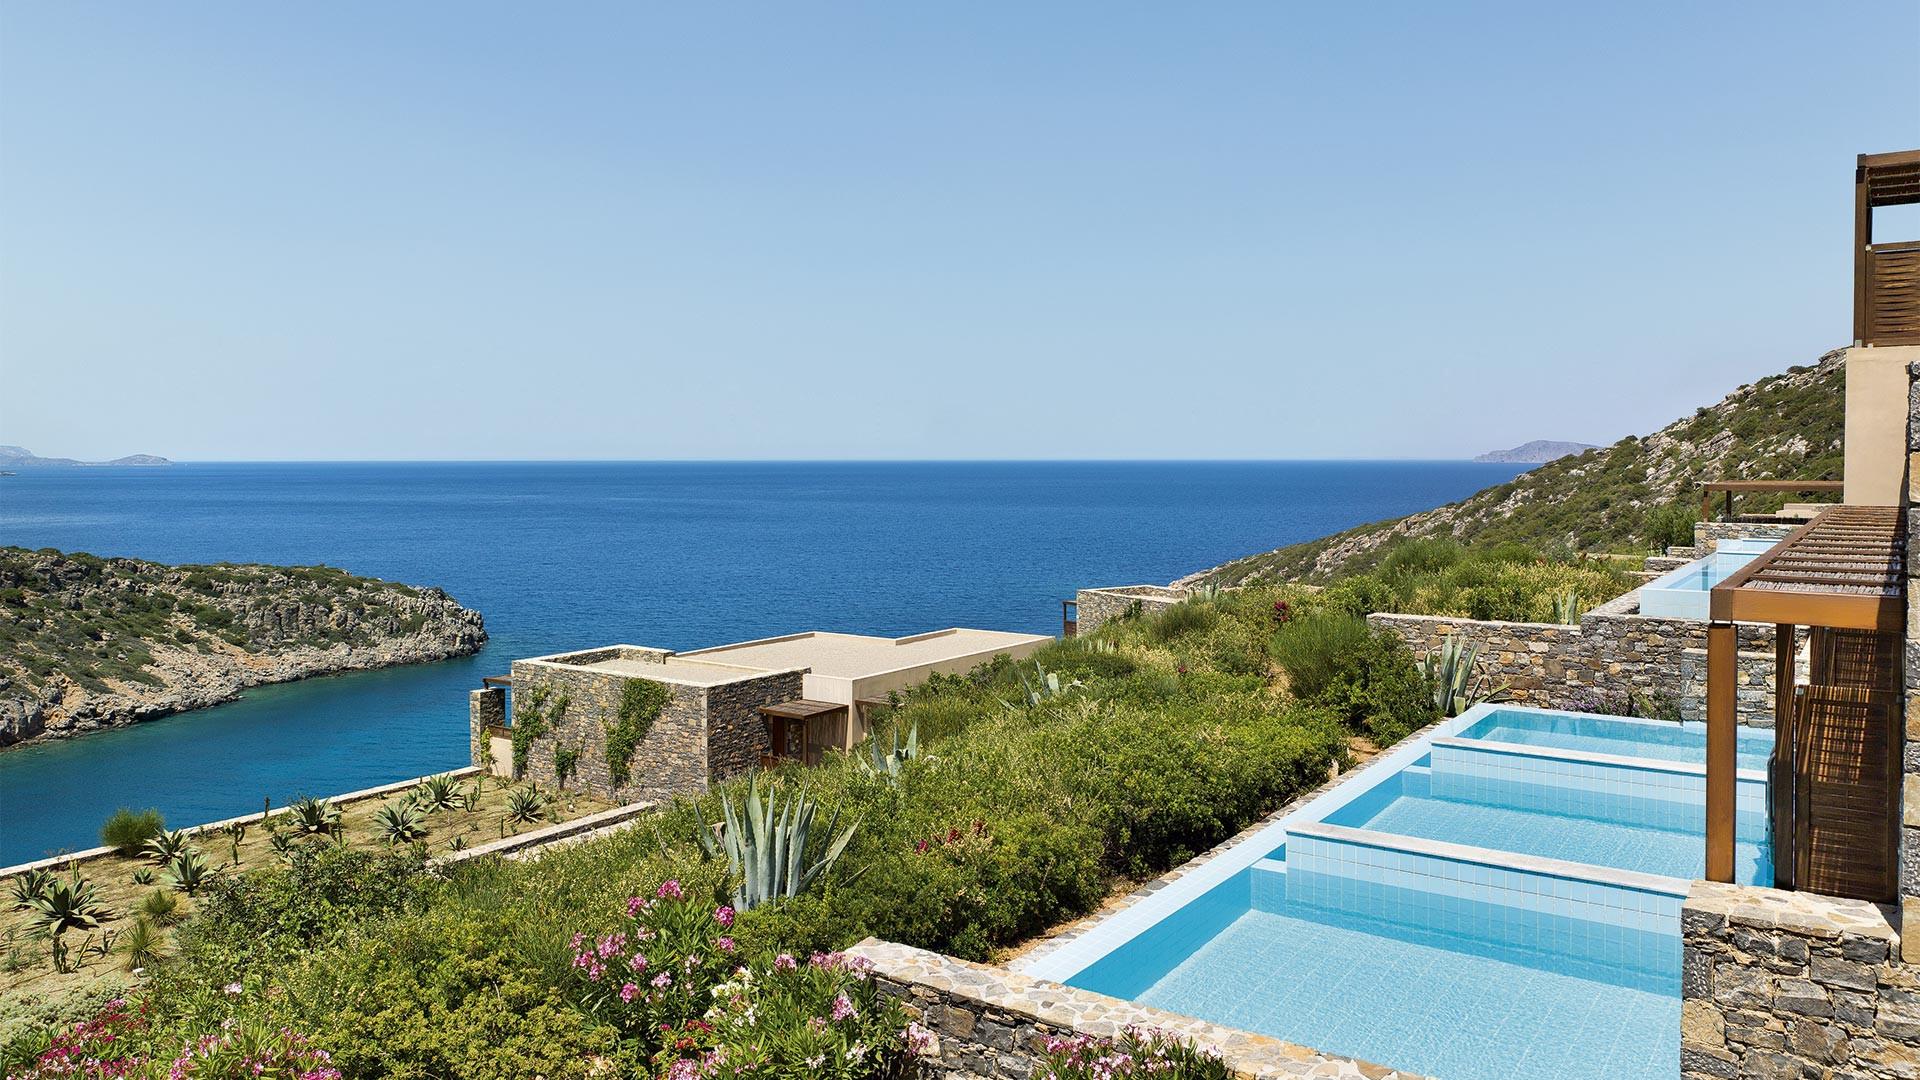 Swimming pools at Daios Cove, Crete